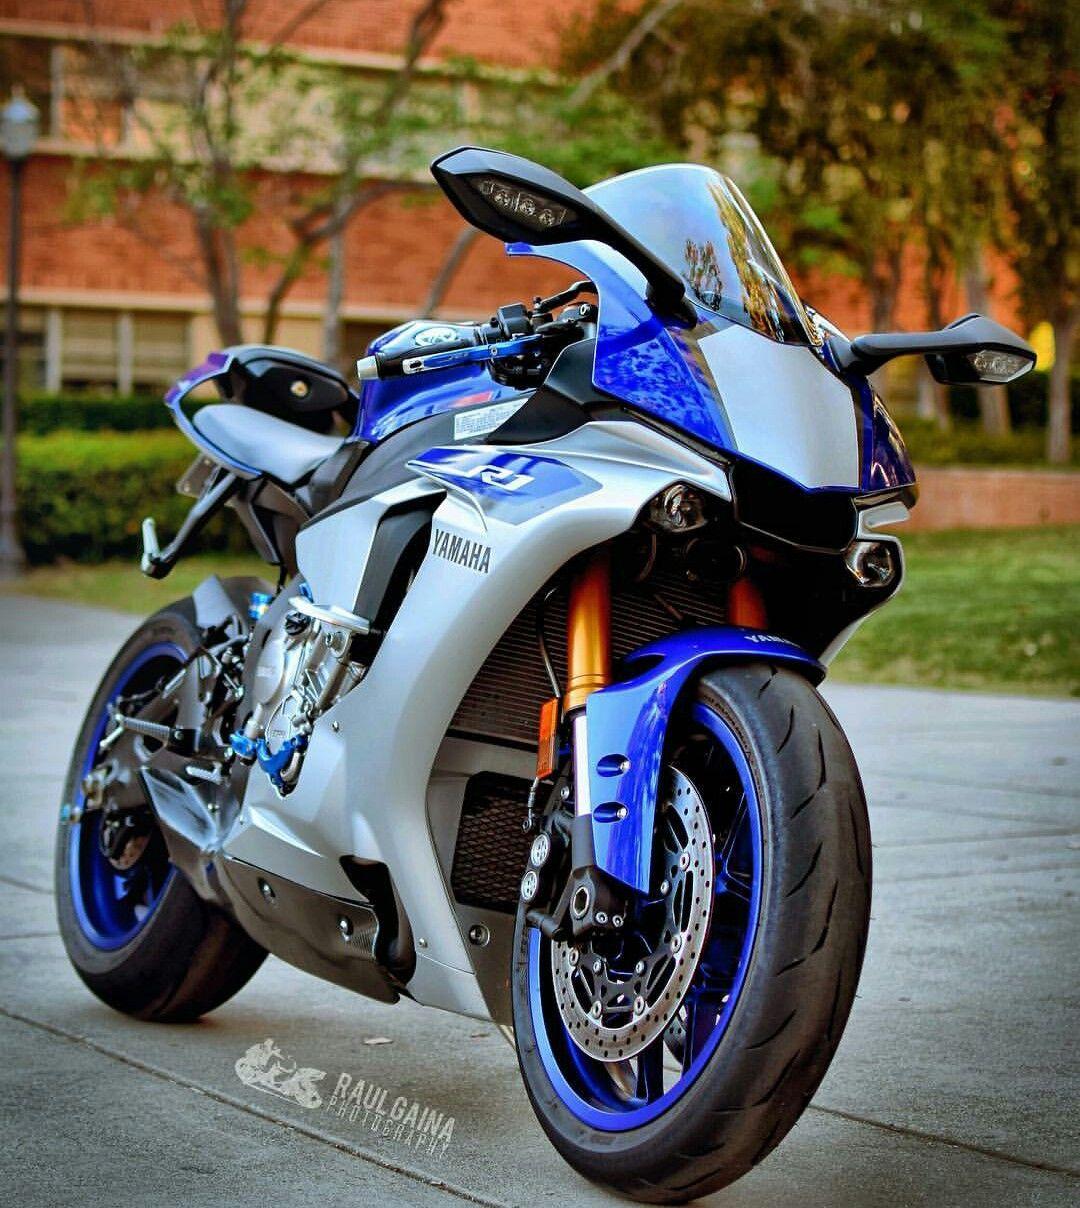 Yamaha R1 Super bikes, Sportbikes, Sport bikes